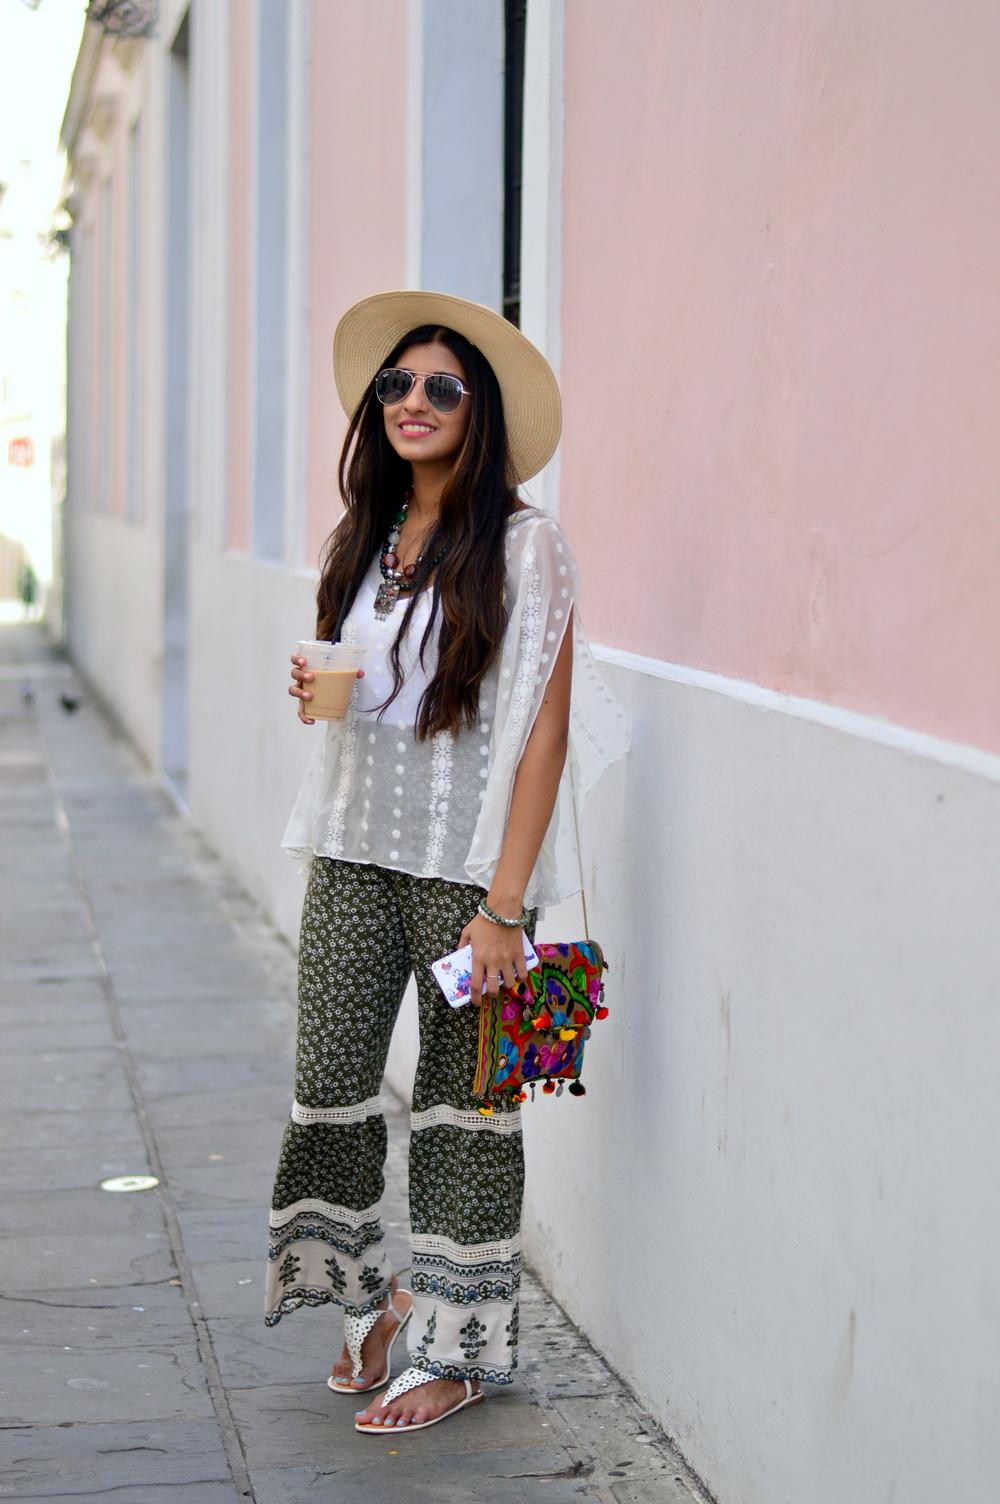 Extrêmement Hippie Chic: Old San Juan, Puerto Rico — Miss Minus Sized LU51